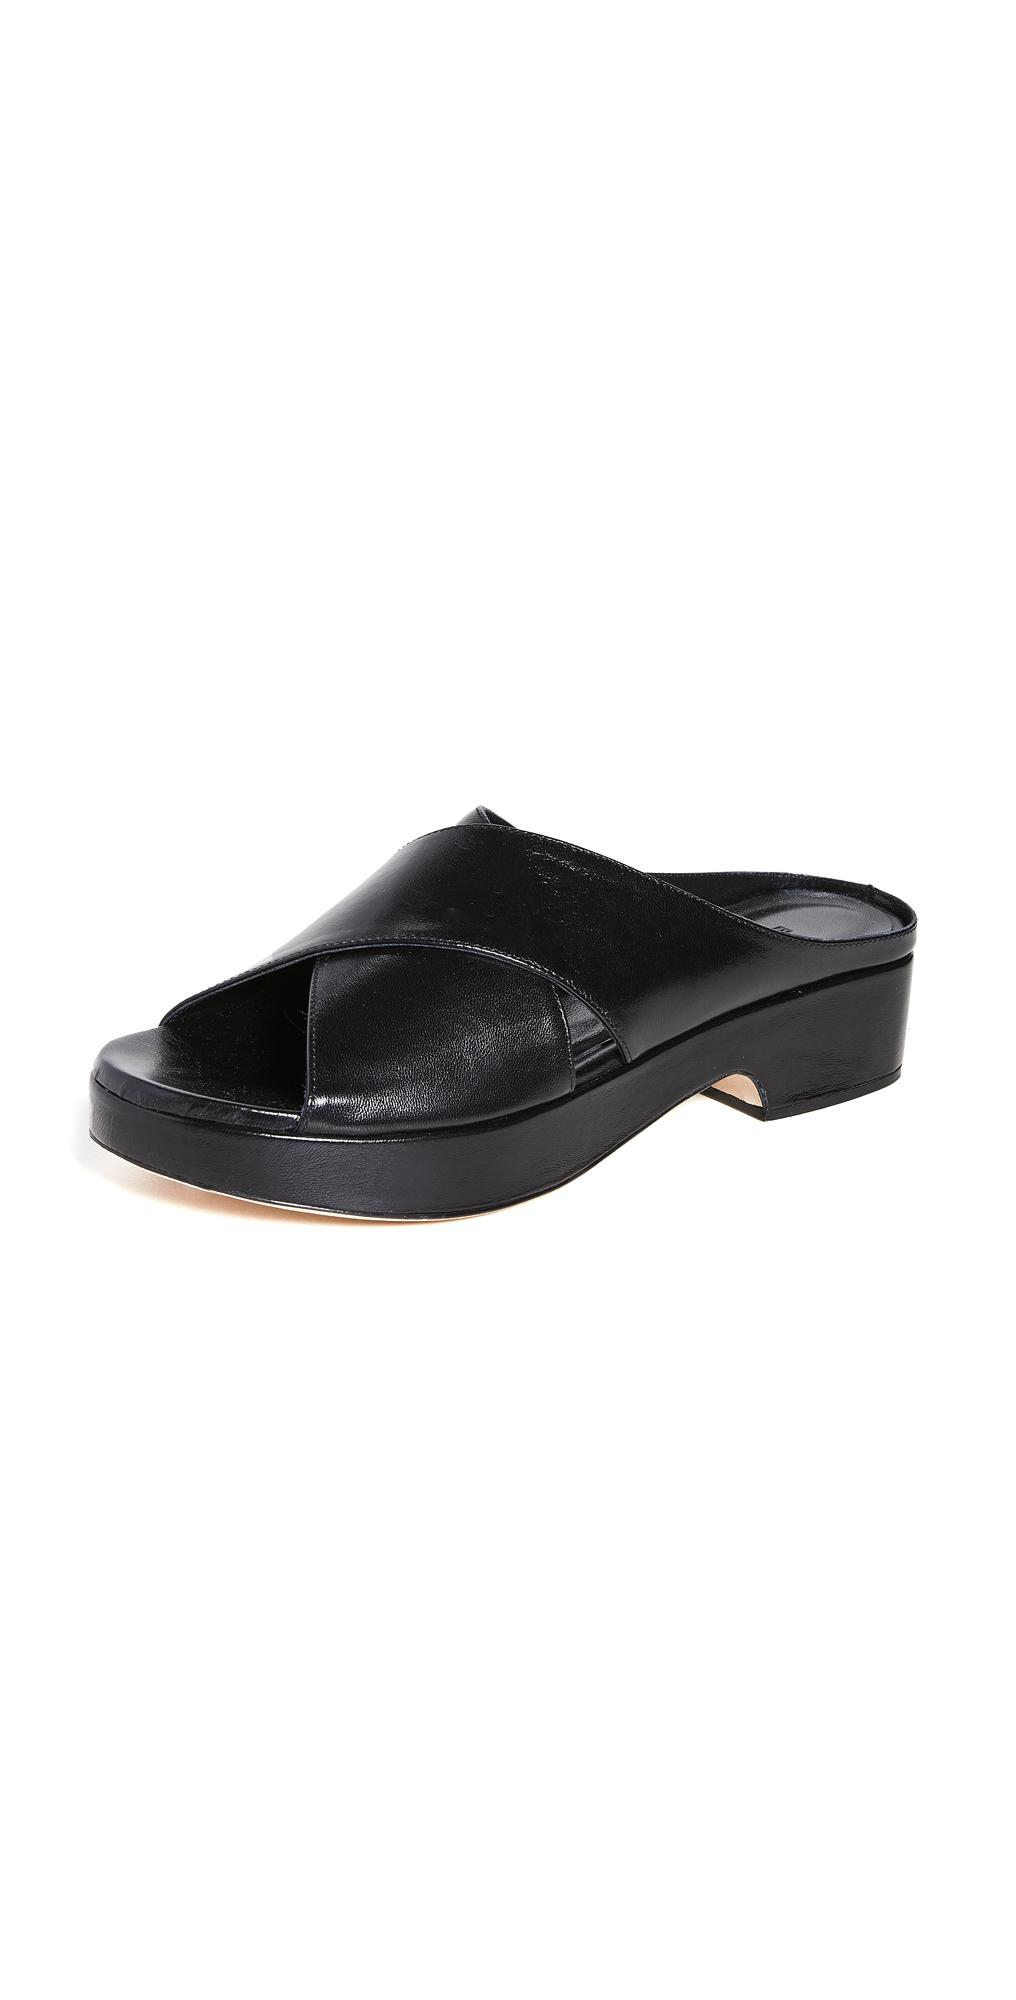 BY FAR Iggy Slide Sandals